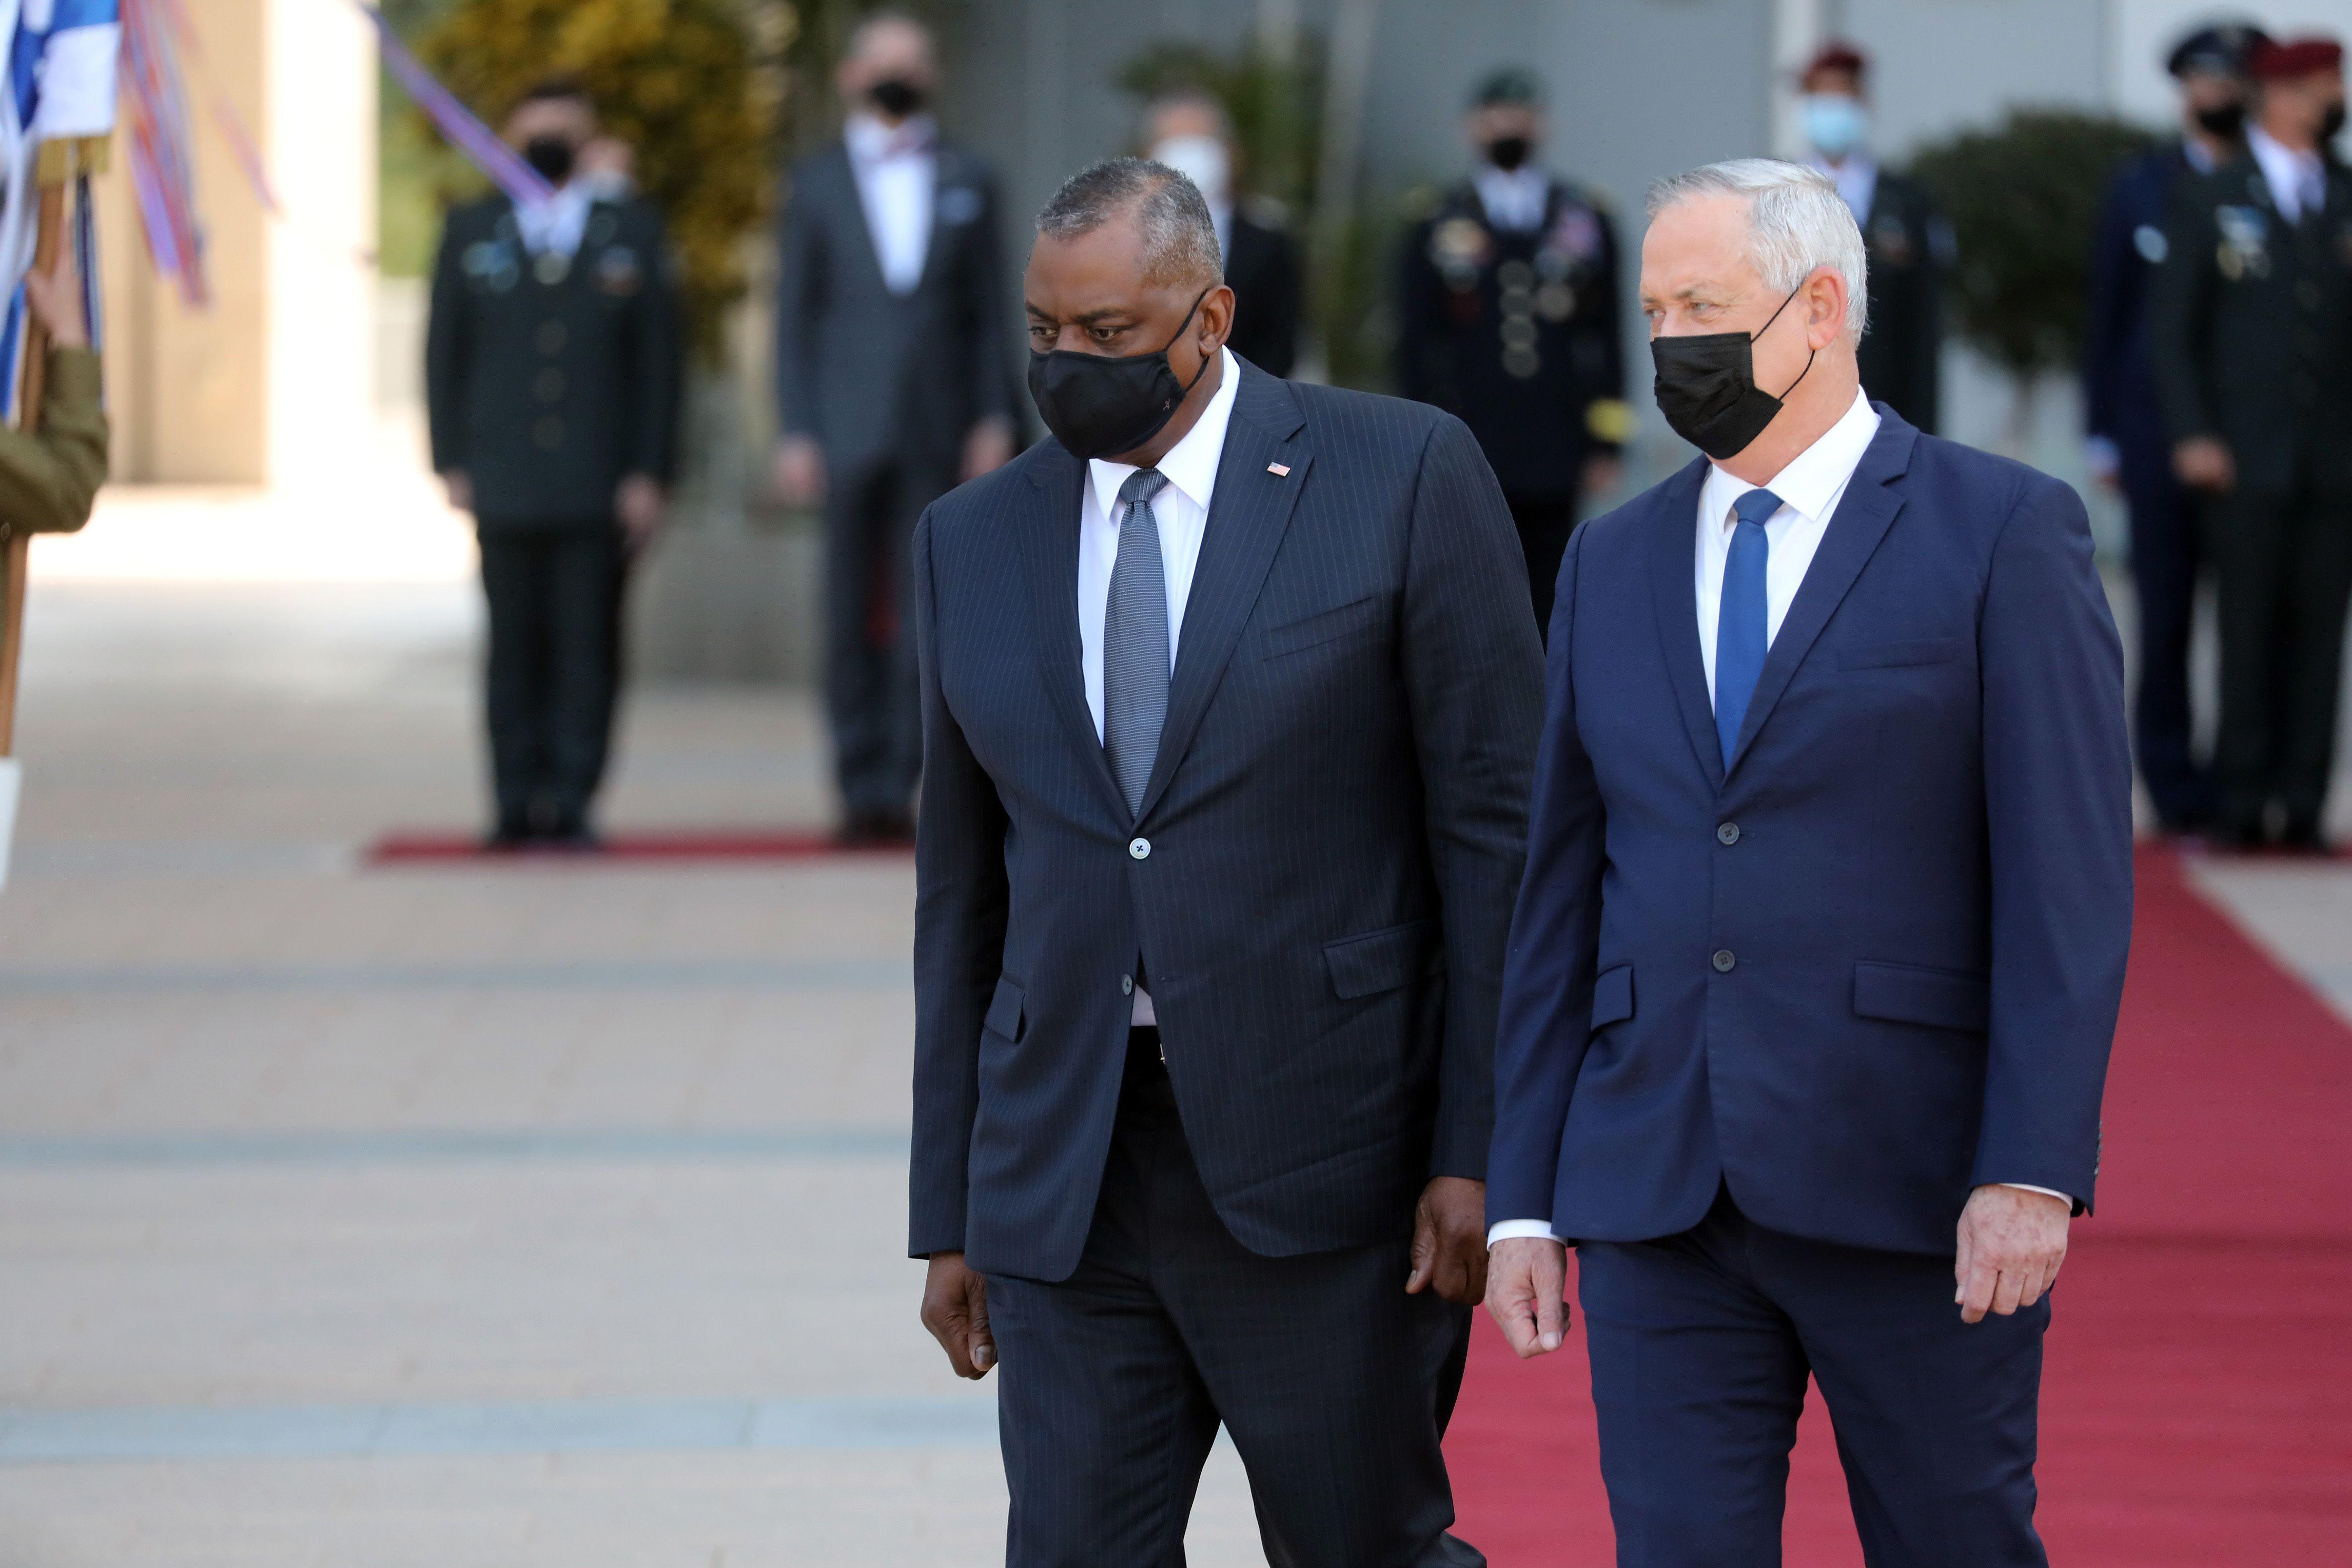 U.S. Defense Secretary Lloyd Austin (L) and Israeli Defense Minister Benny Gantz are seen at a ceremony at the Kirya military base in Tel Aviv, Israel on April 11, 2021.